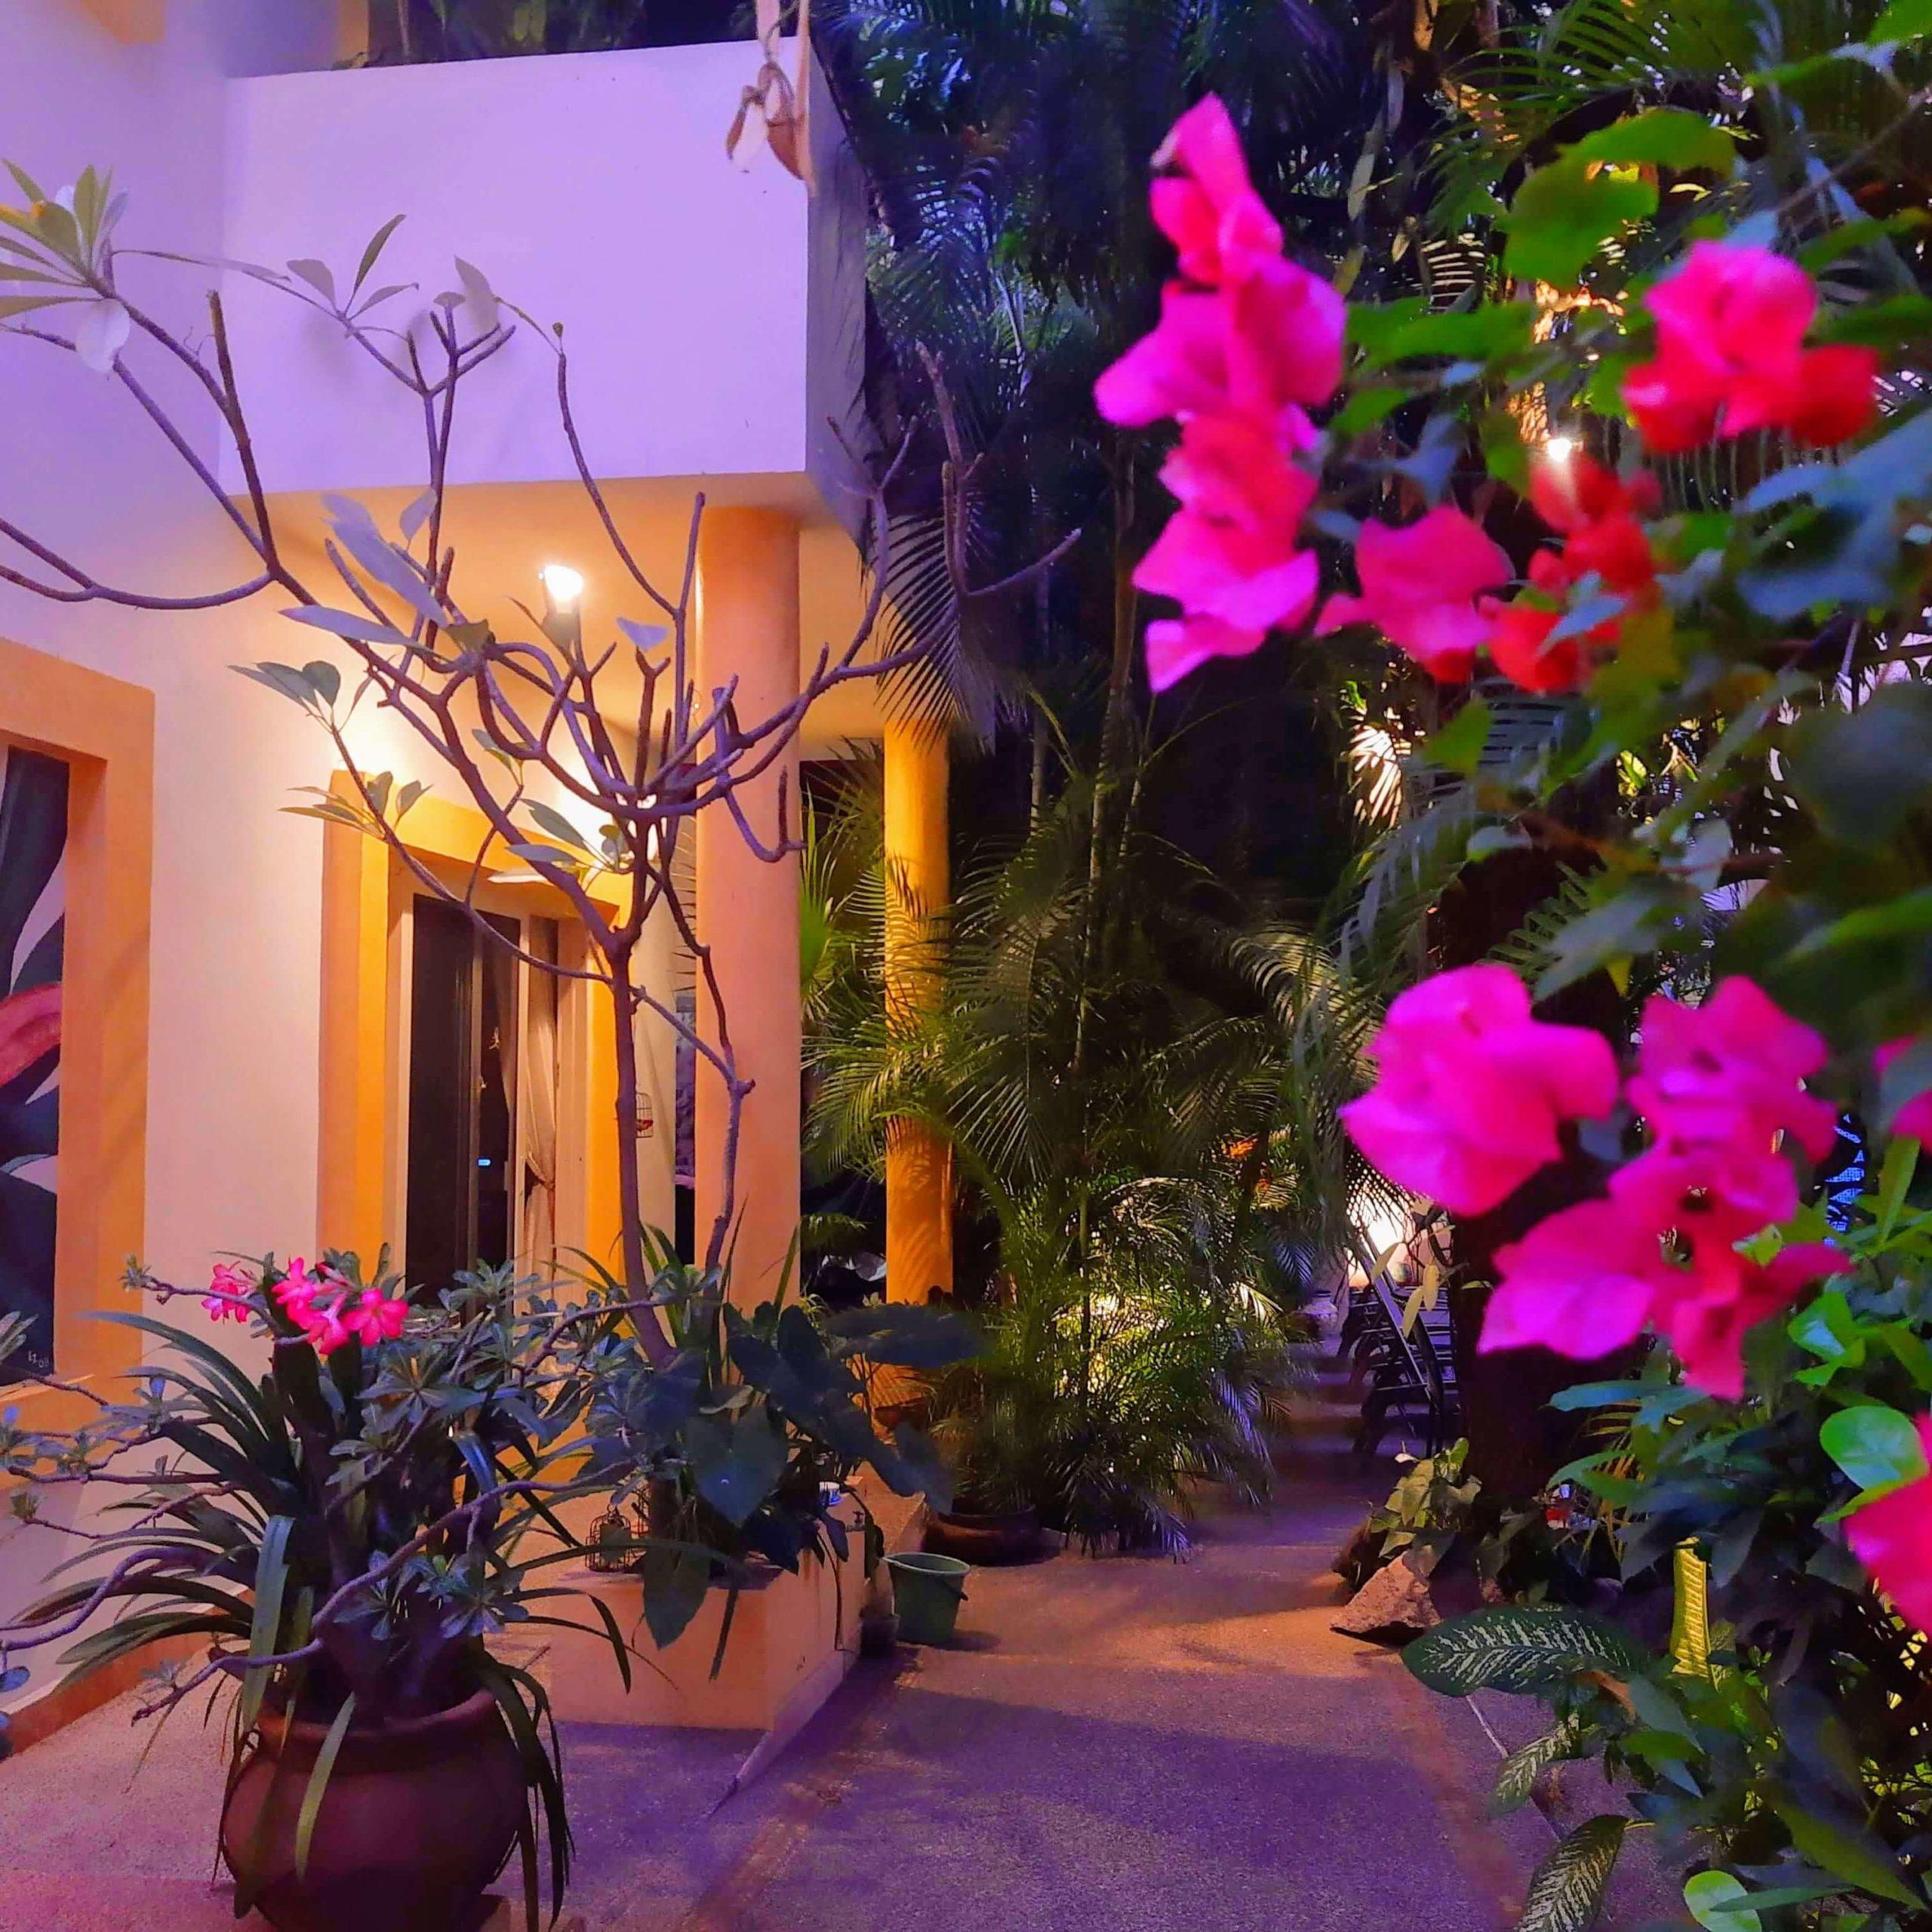 The garden at Hacienda Alemanalit by moonlight